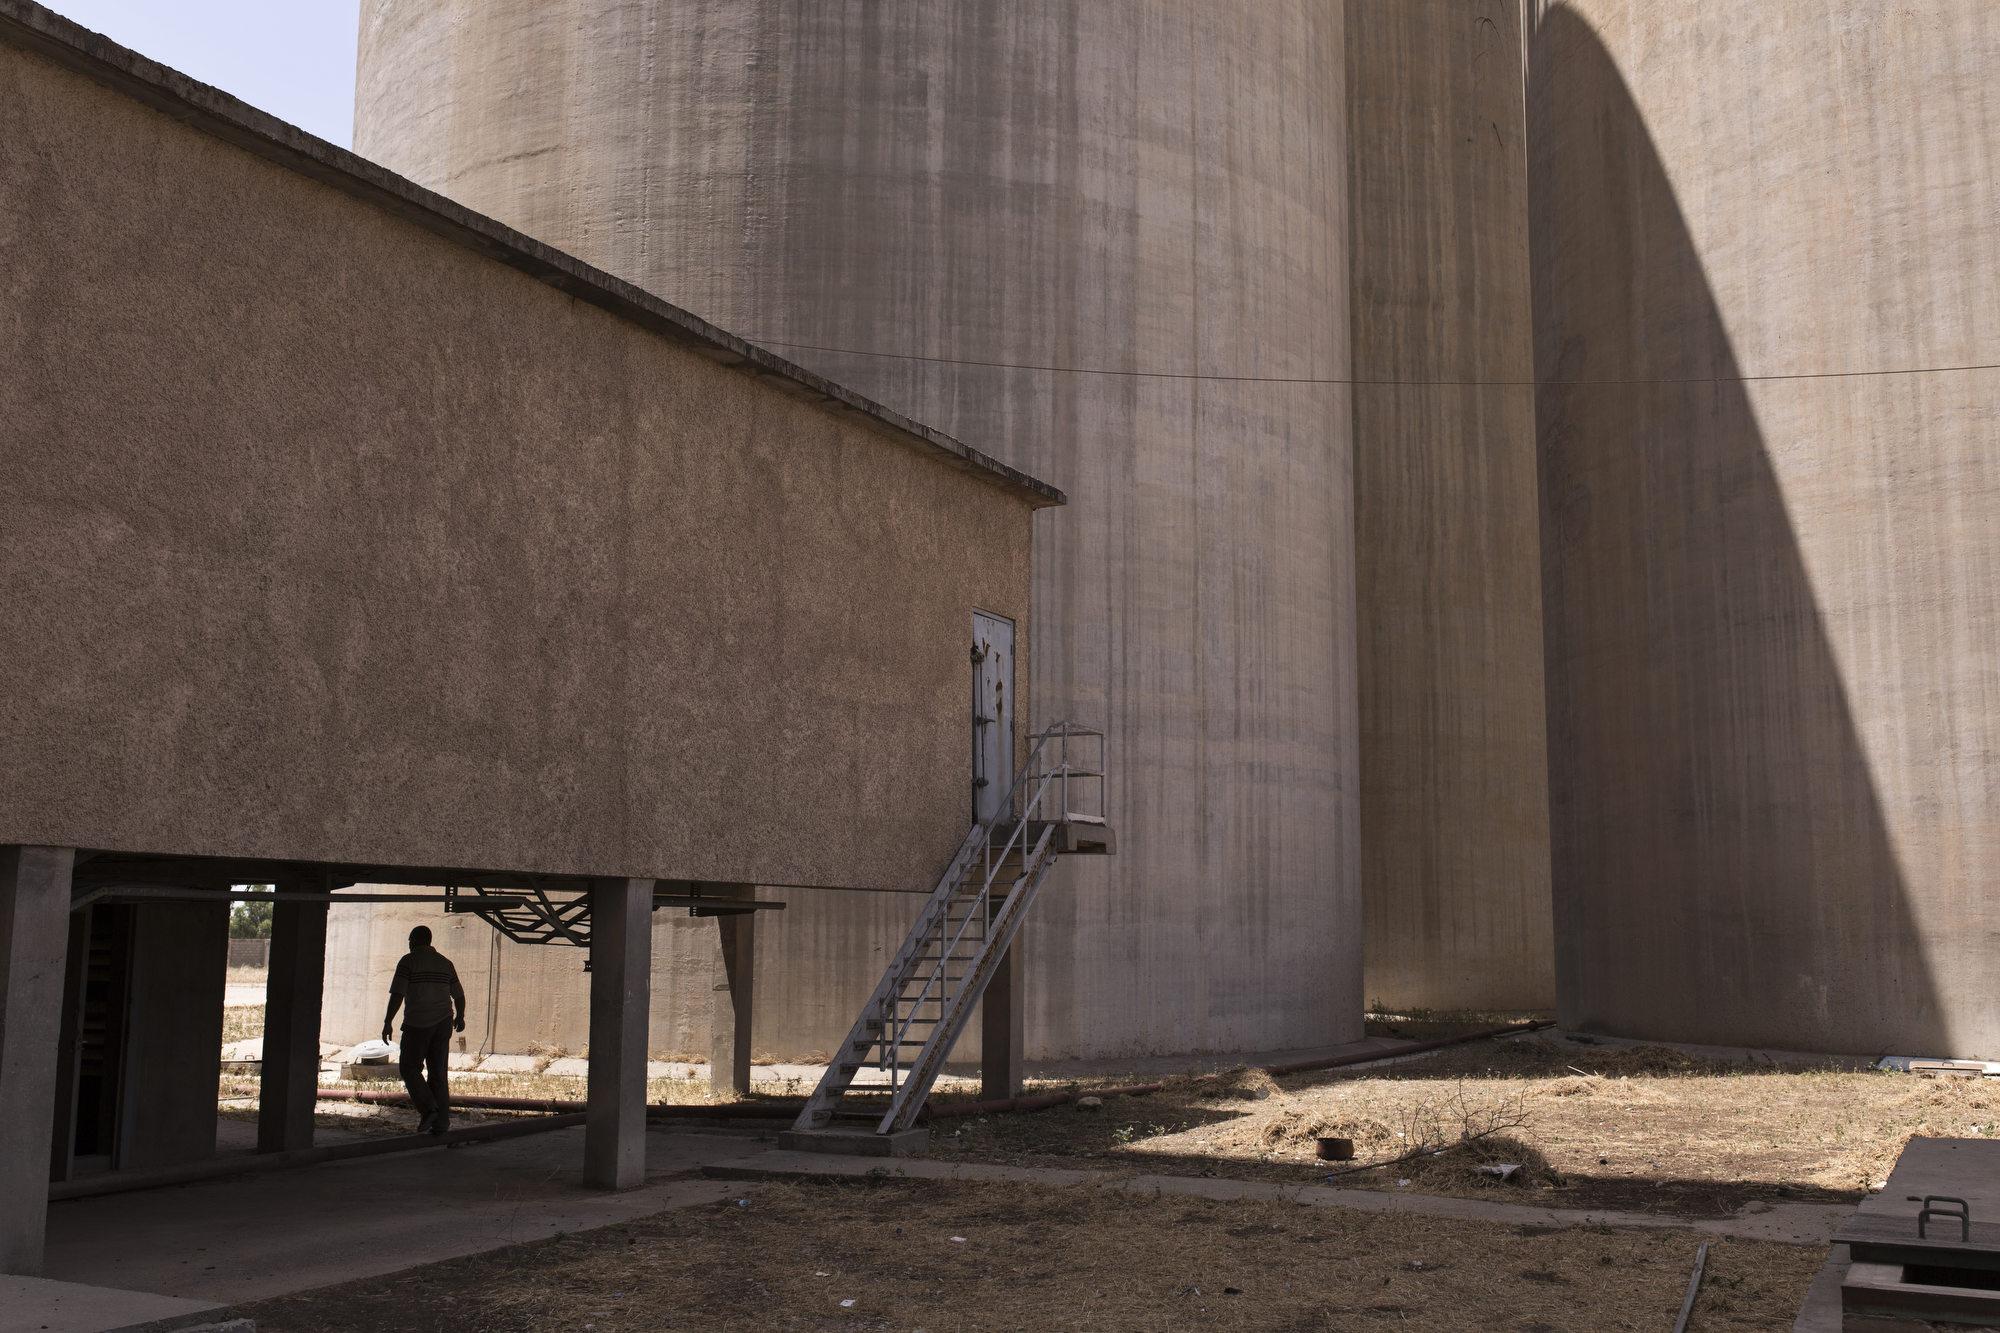 A man walks through the site of a grain silo.